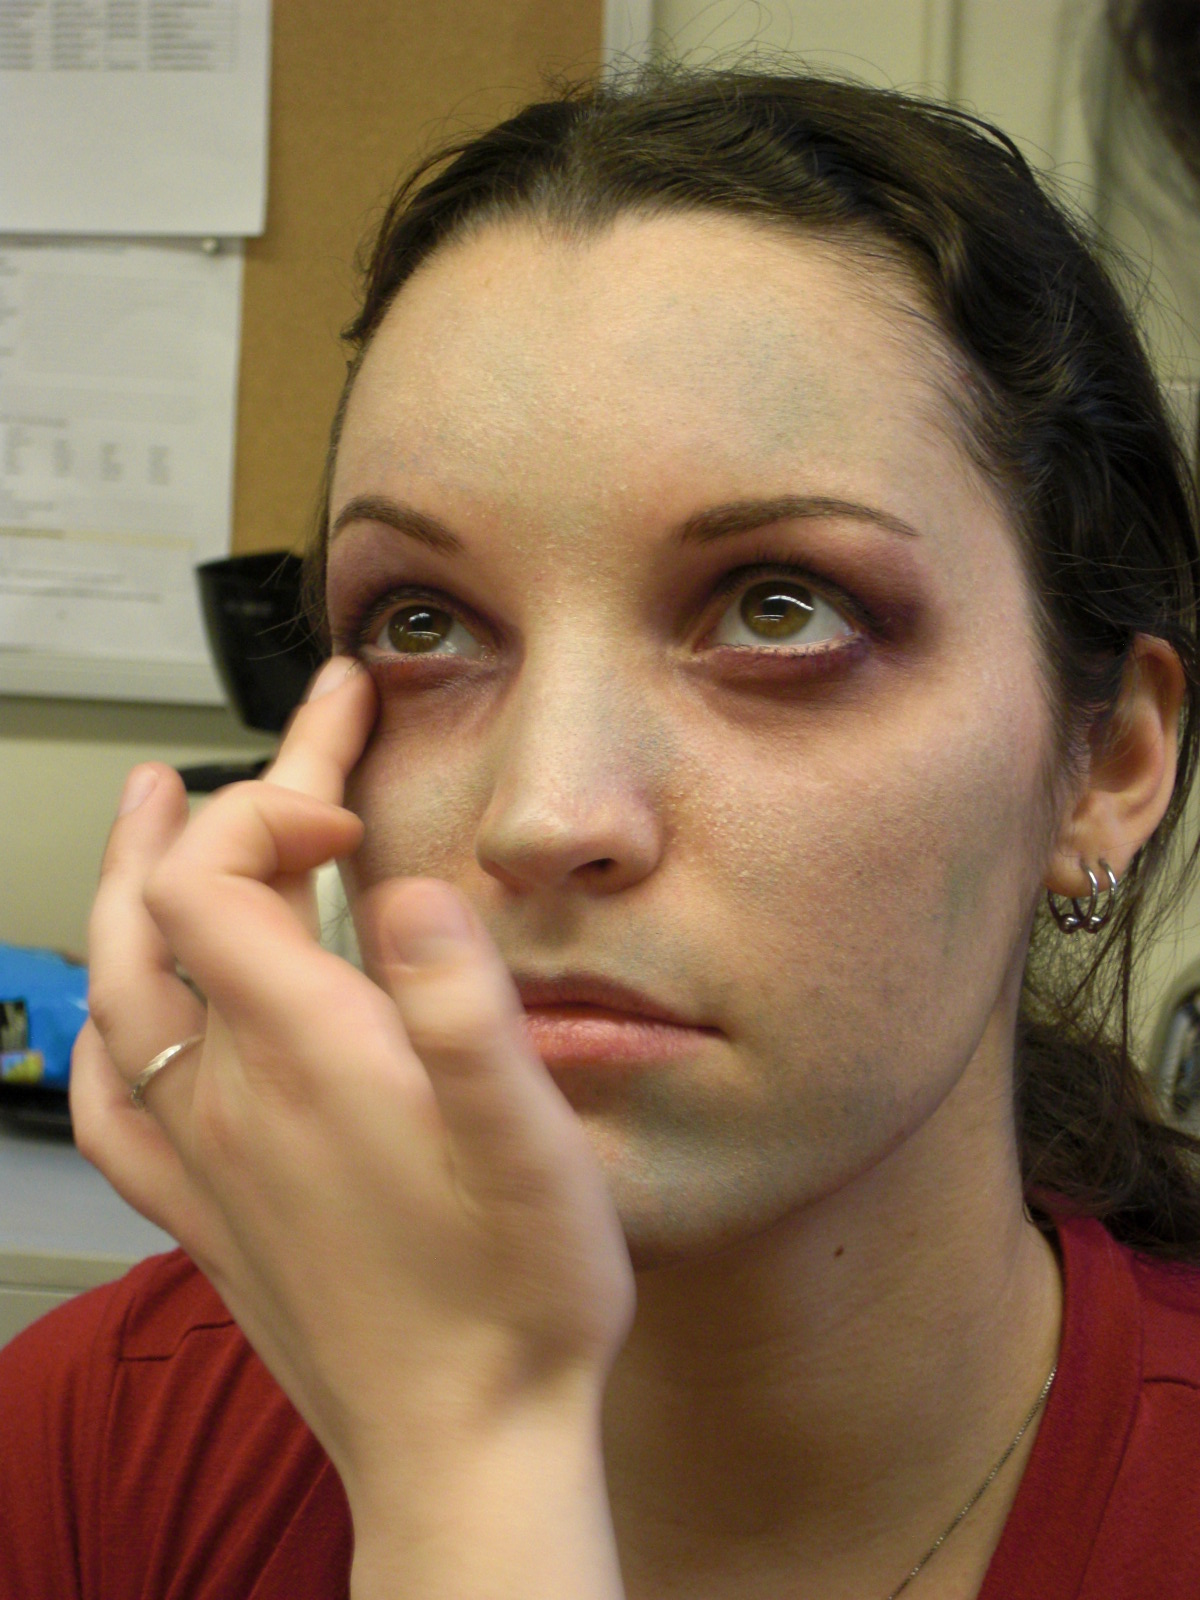 Zombie Eye Makeup You - Mugeek Vidalondon